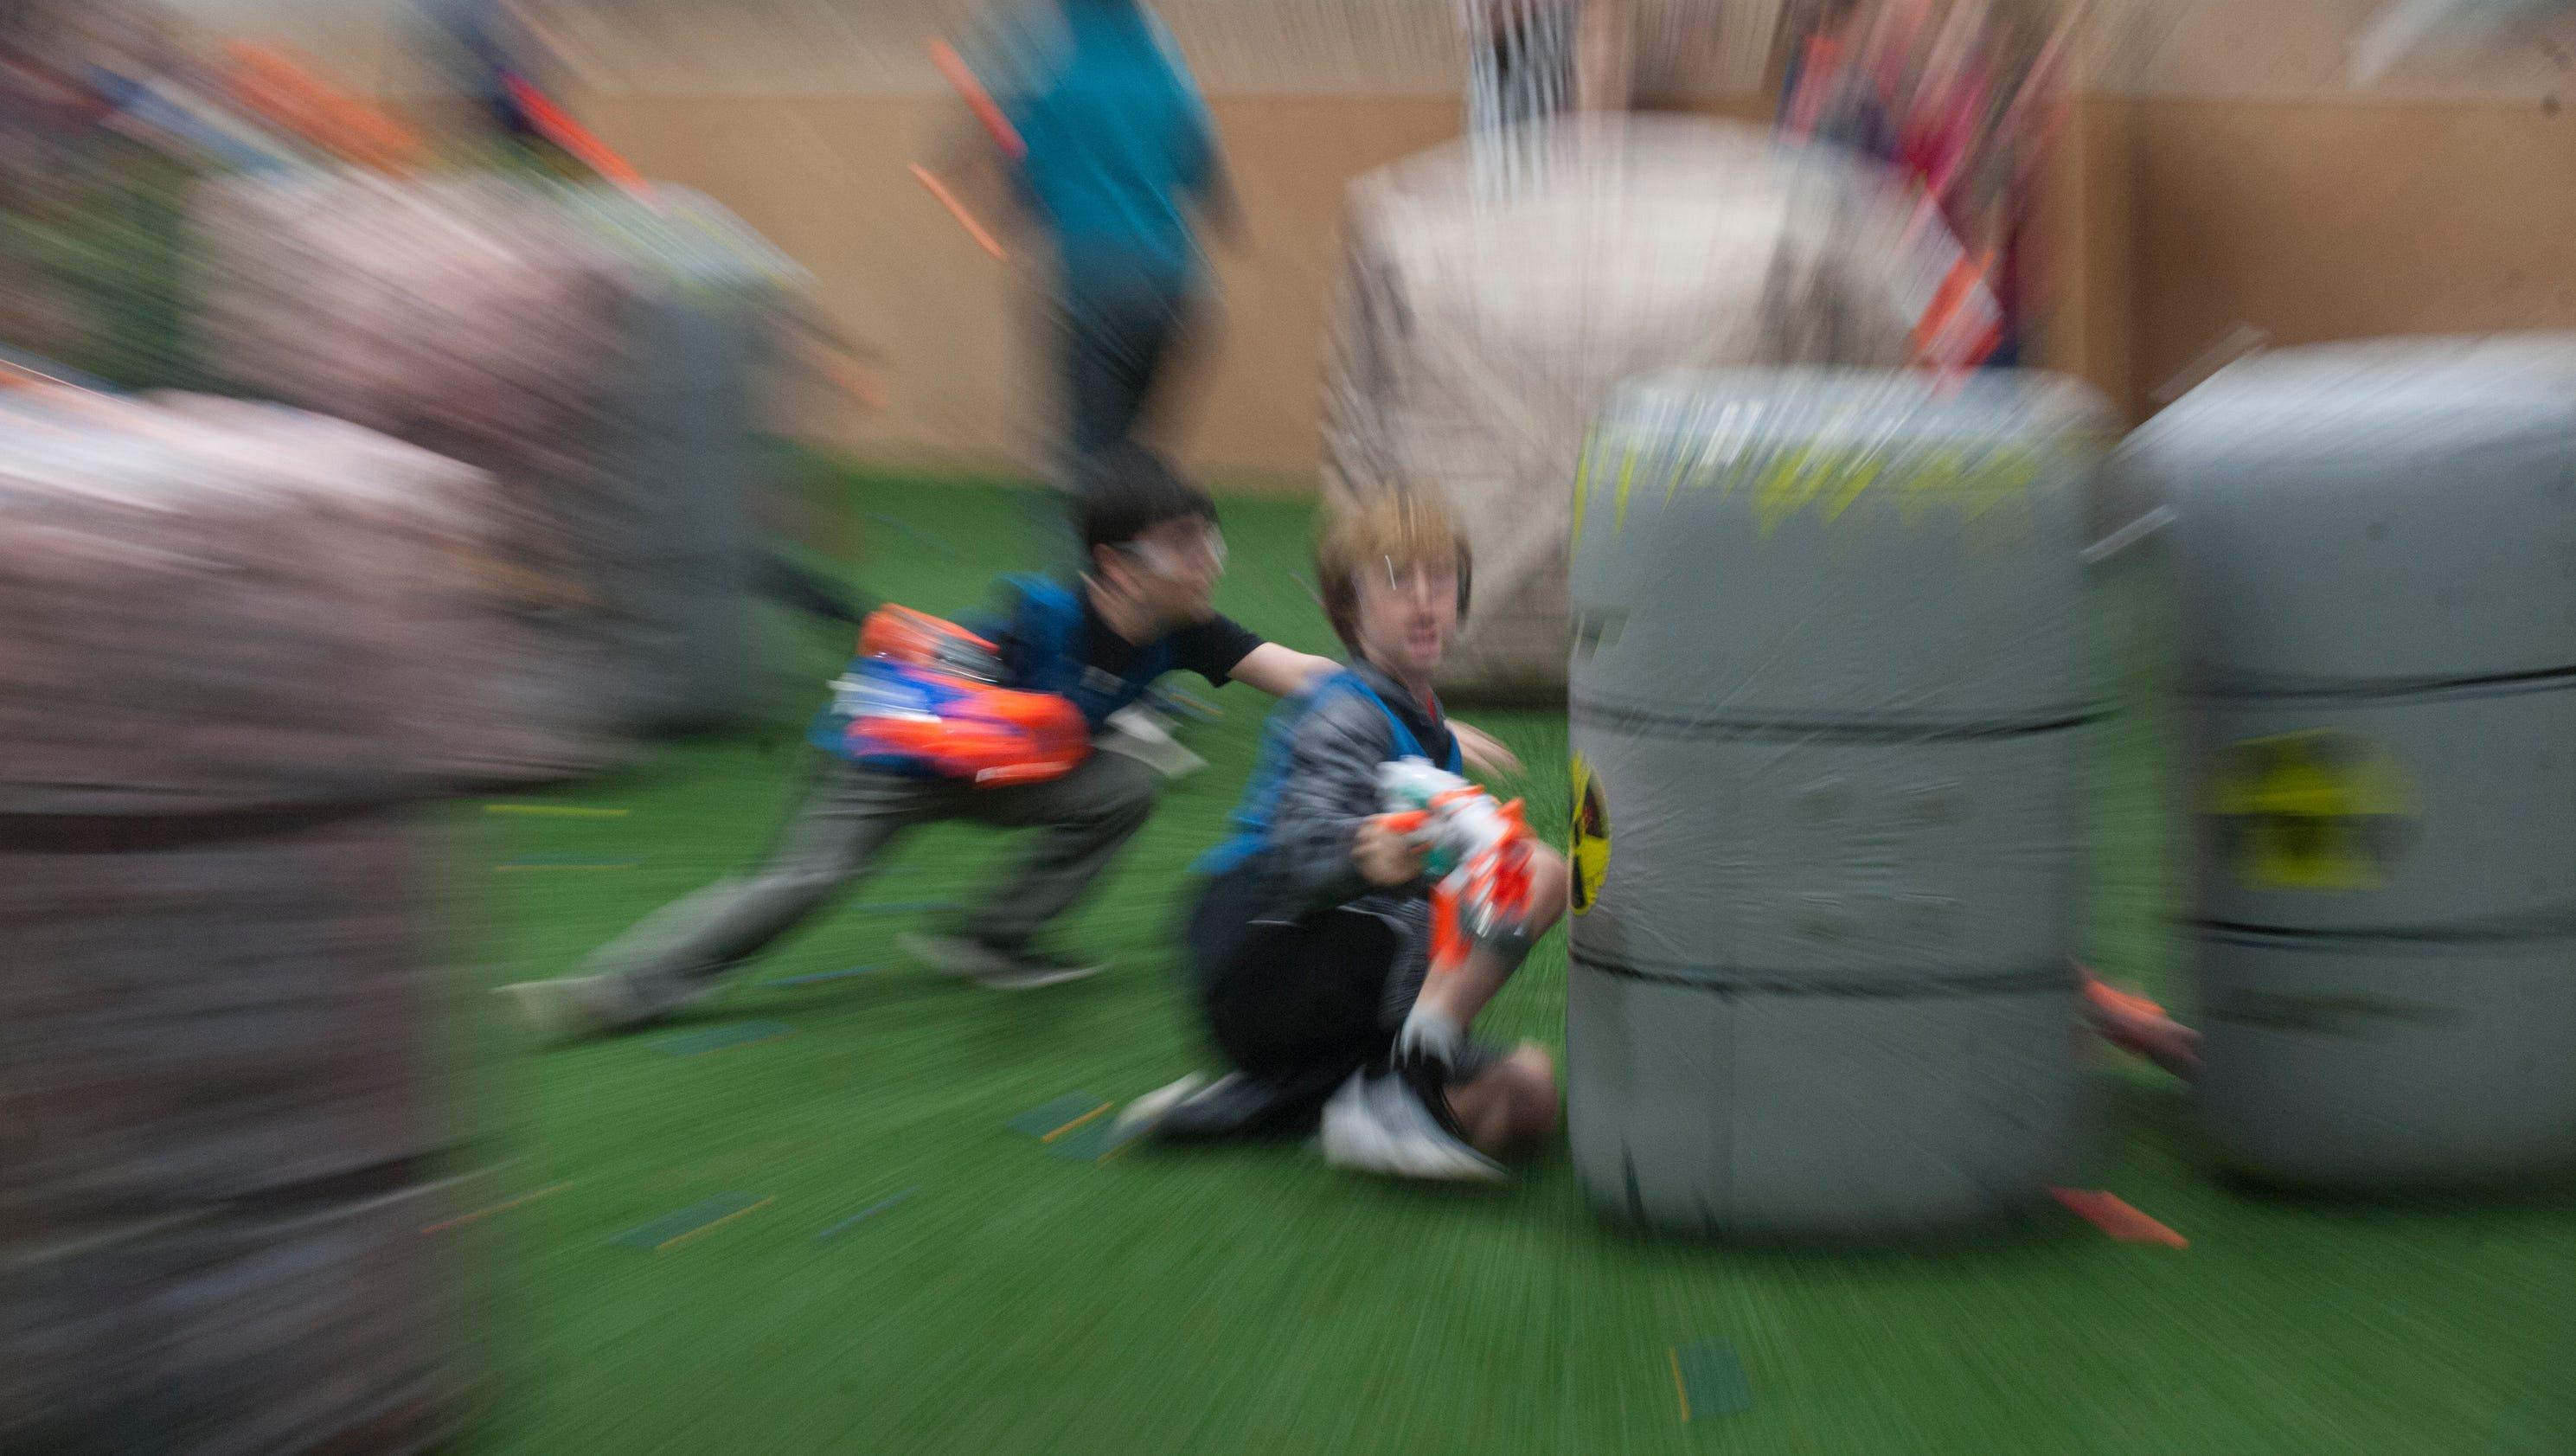 'Get into it, get fun:' Kids battle on Nerf turf